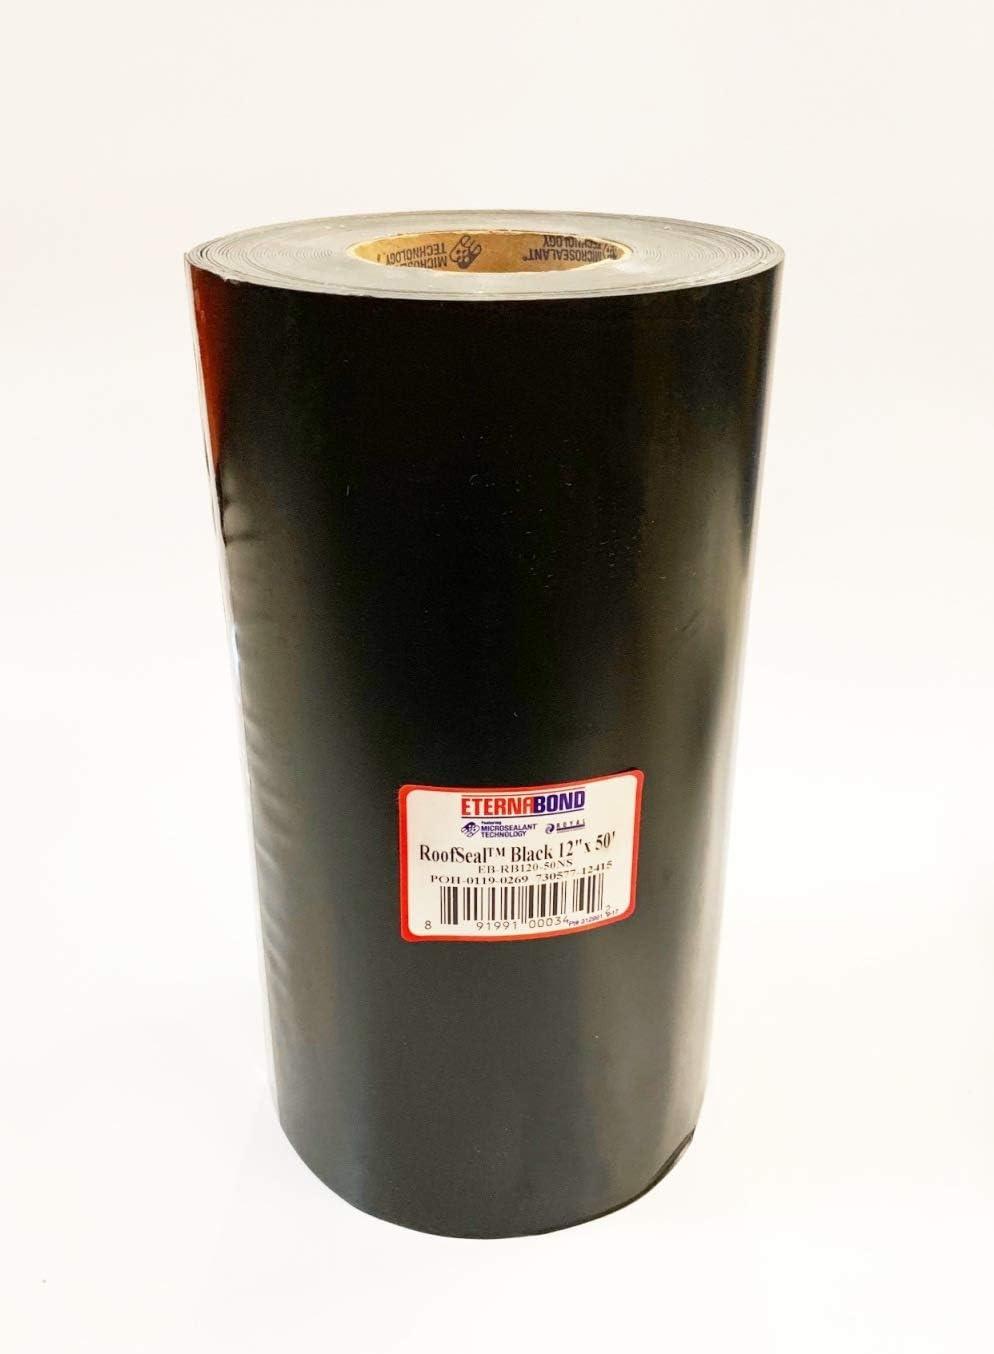 "EternaBond RSB-12-50 Mobile Home RV Rubber Roof Repair Tape Sealant - Black, 12"" x 50'"